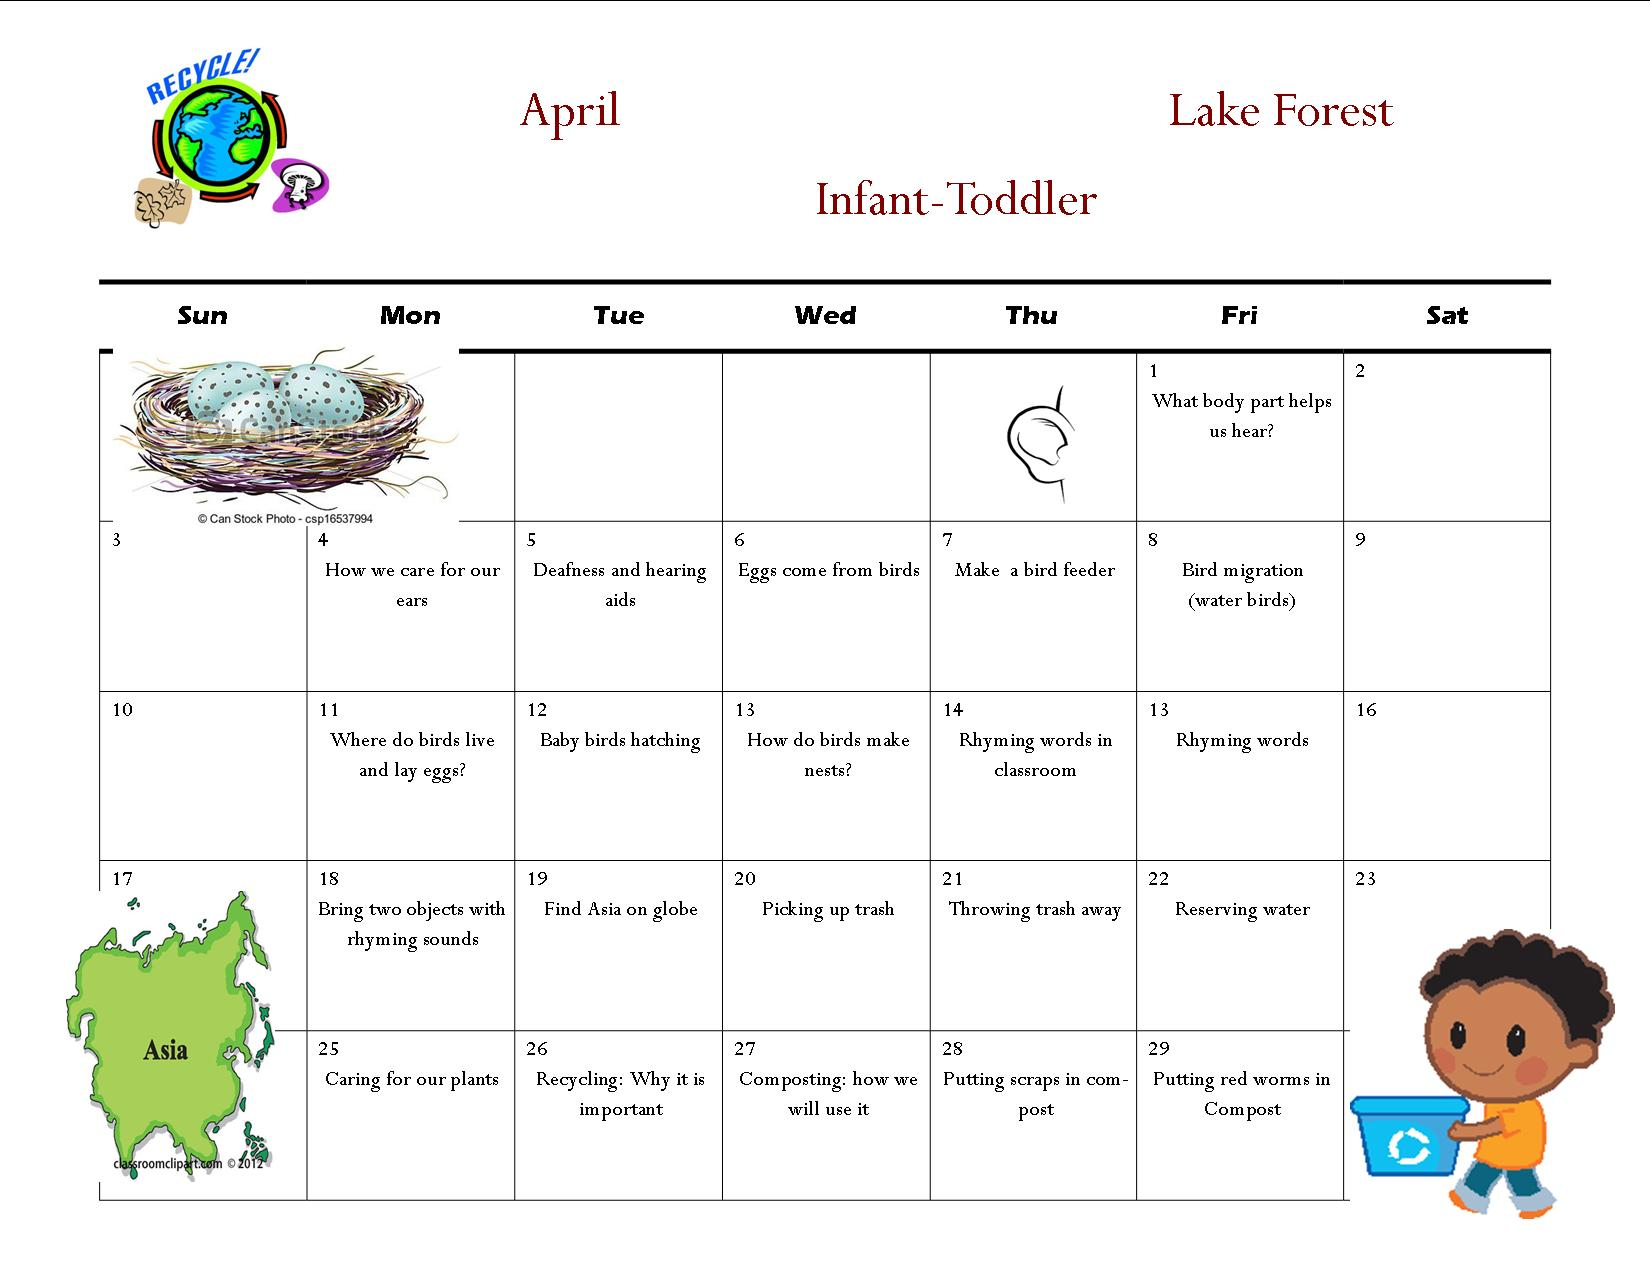 443419-LF_infant__April_2016_calendar